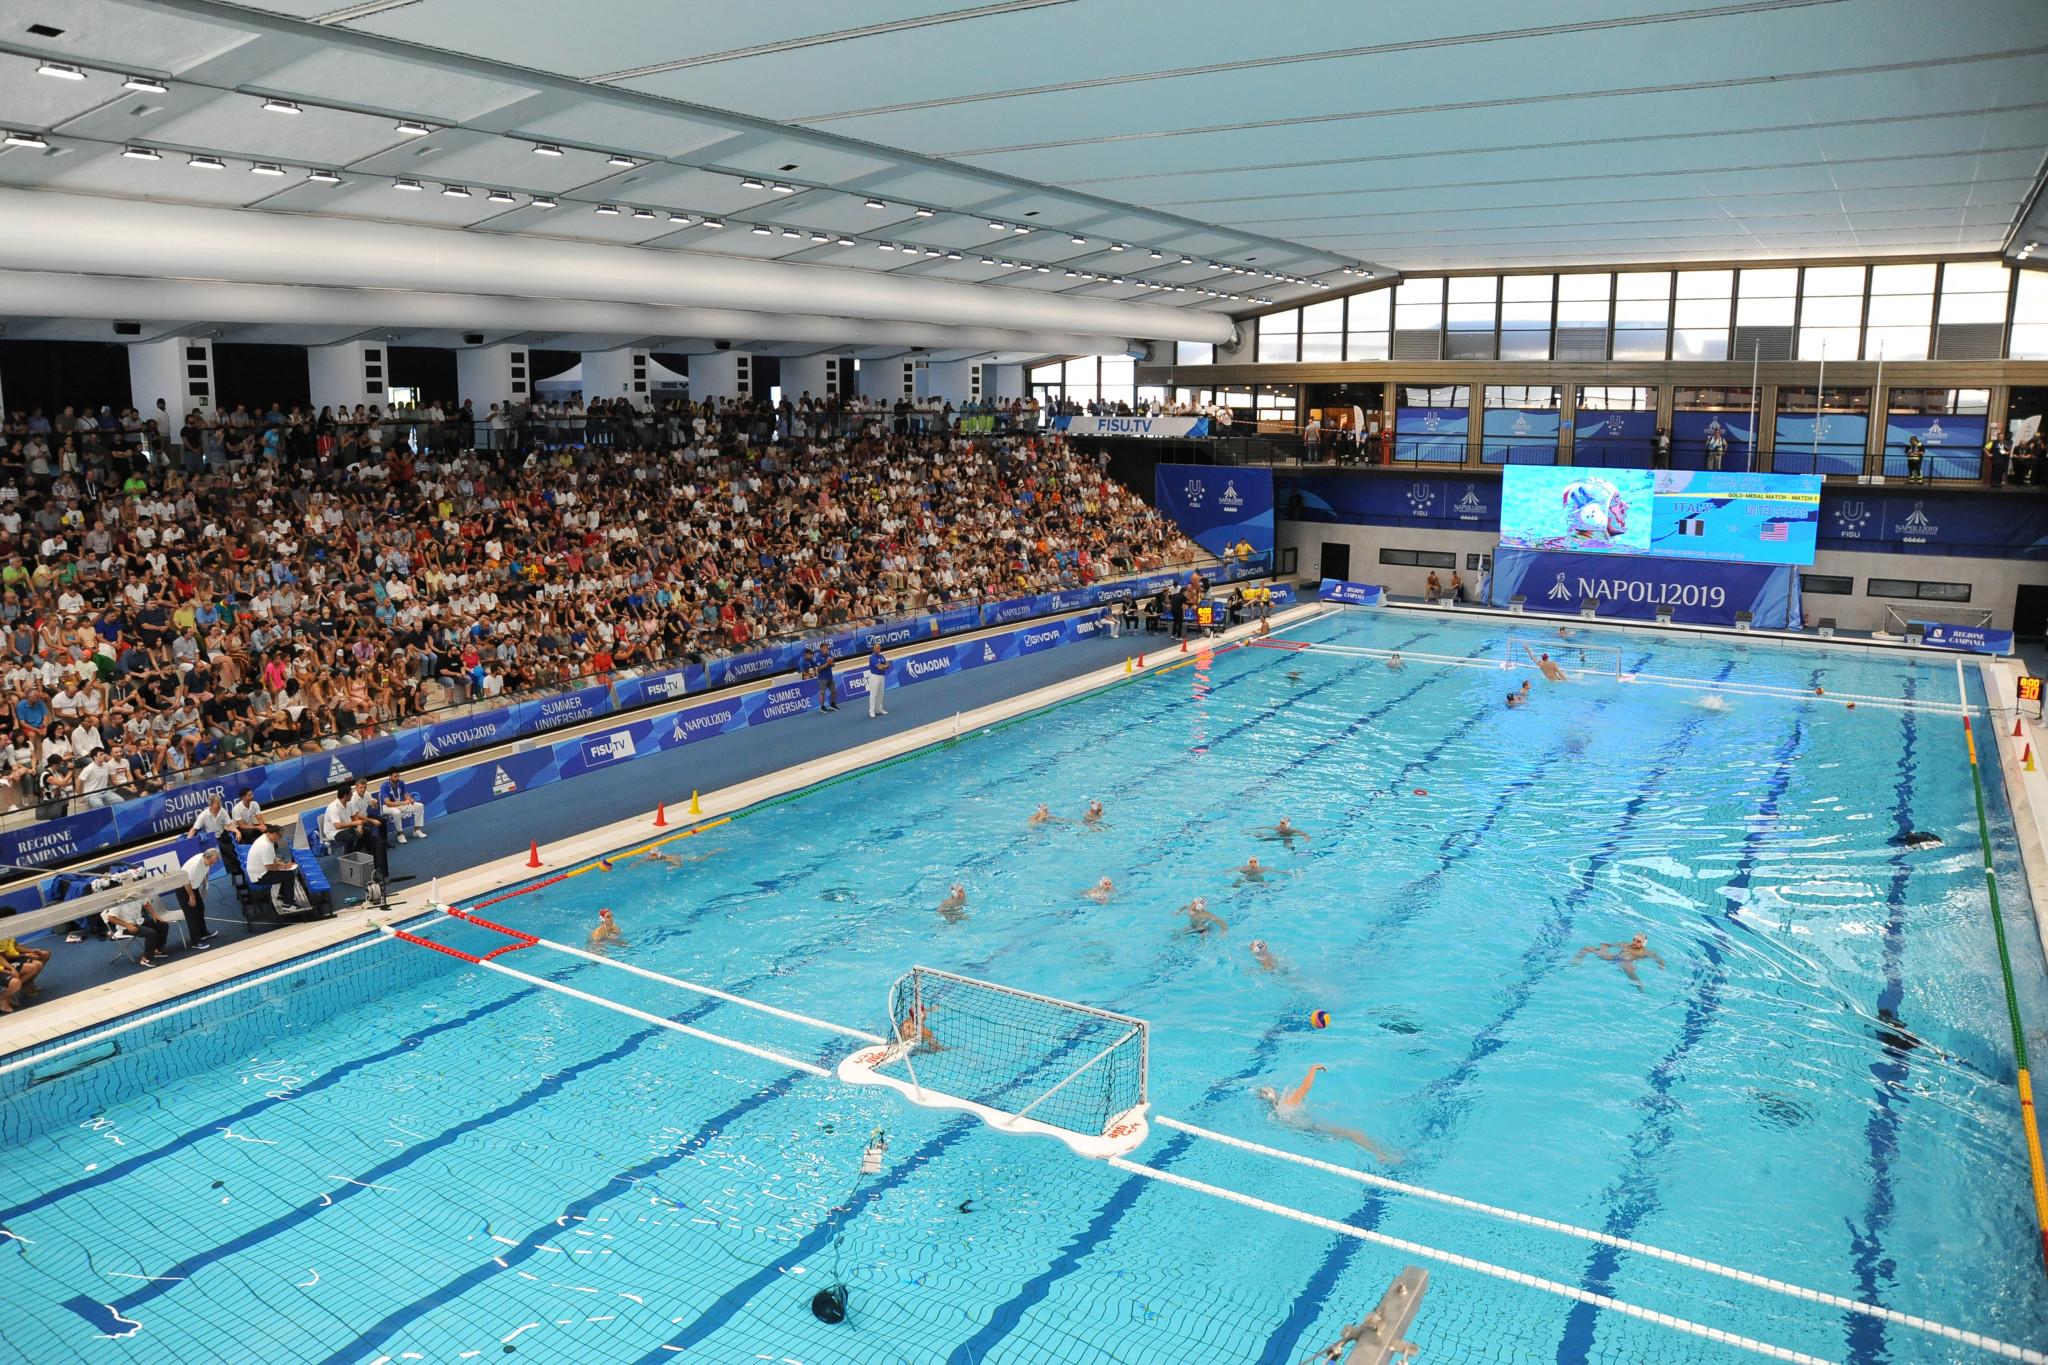 Eurosport to show highlights from 2019 Summer World University Games